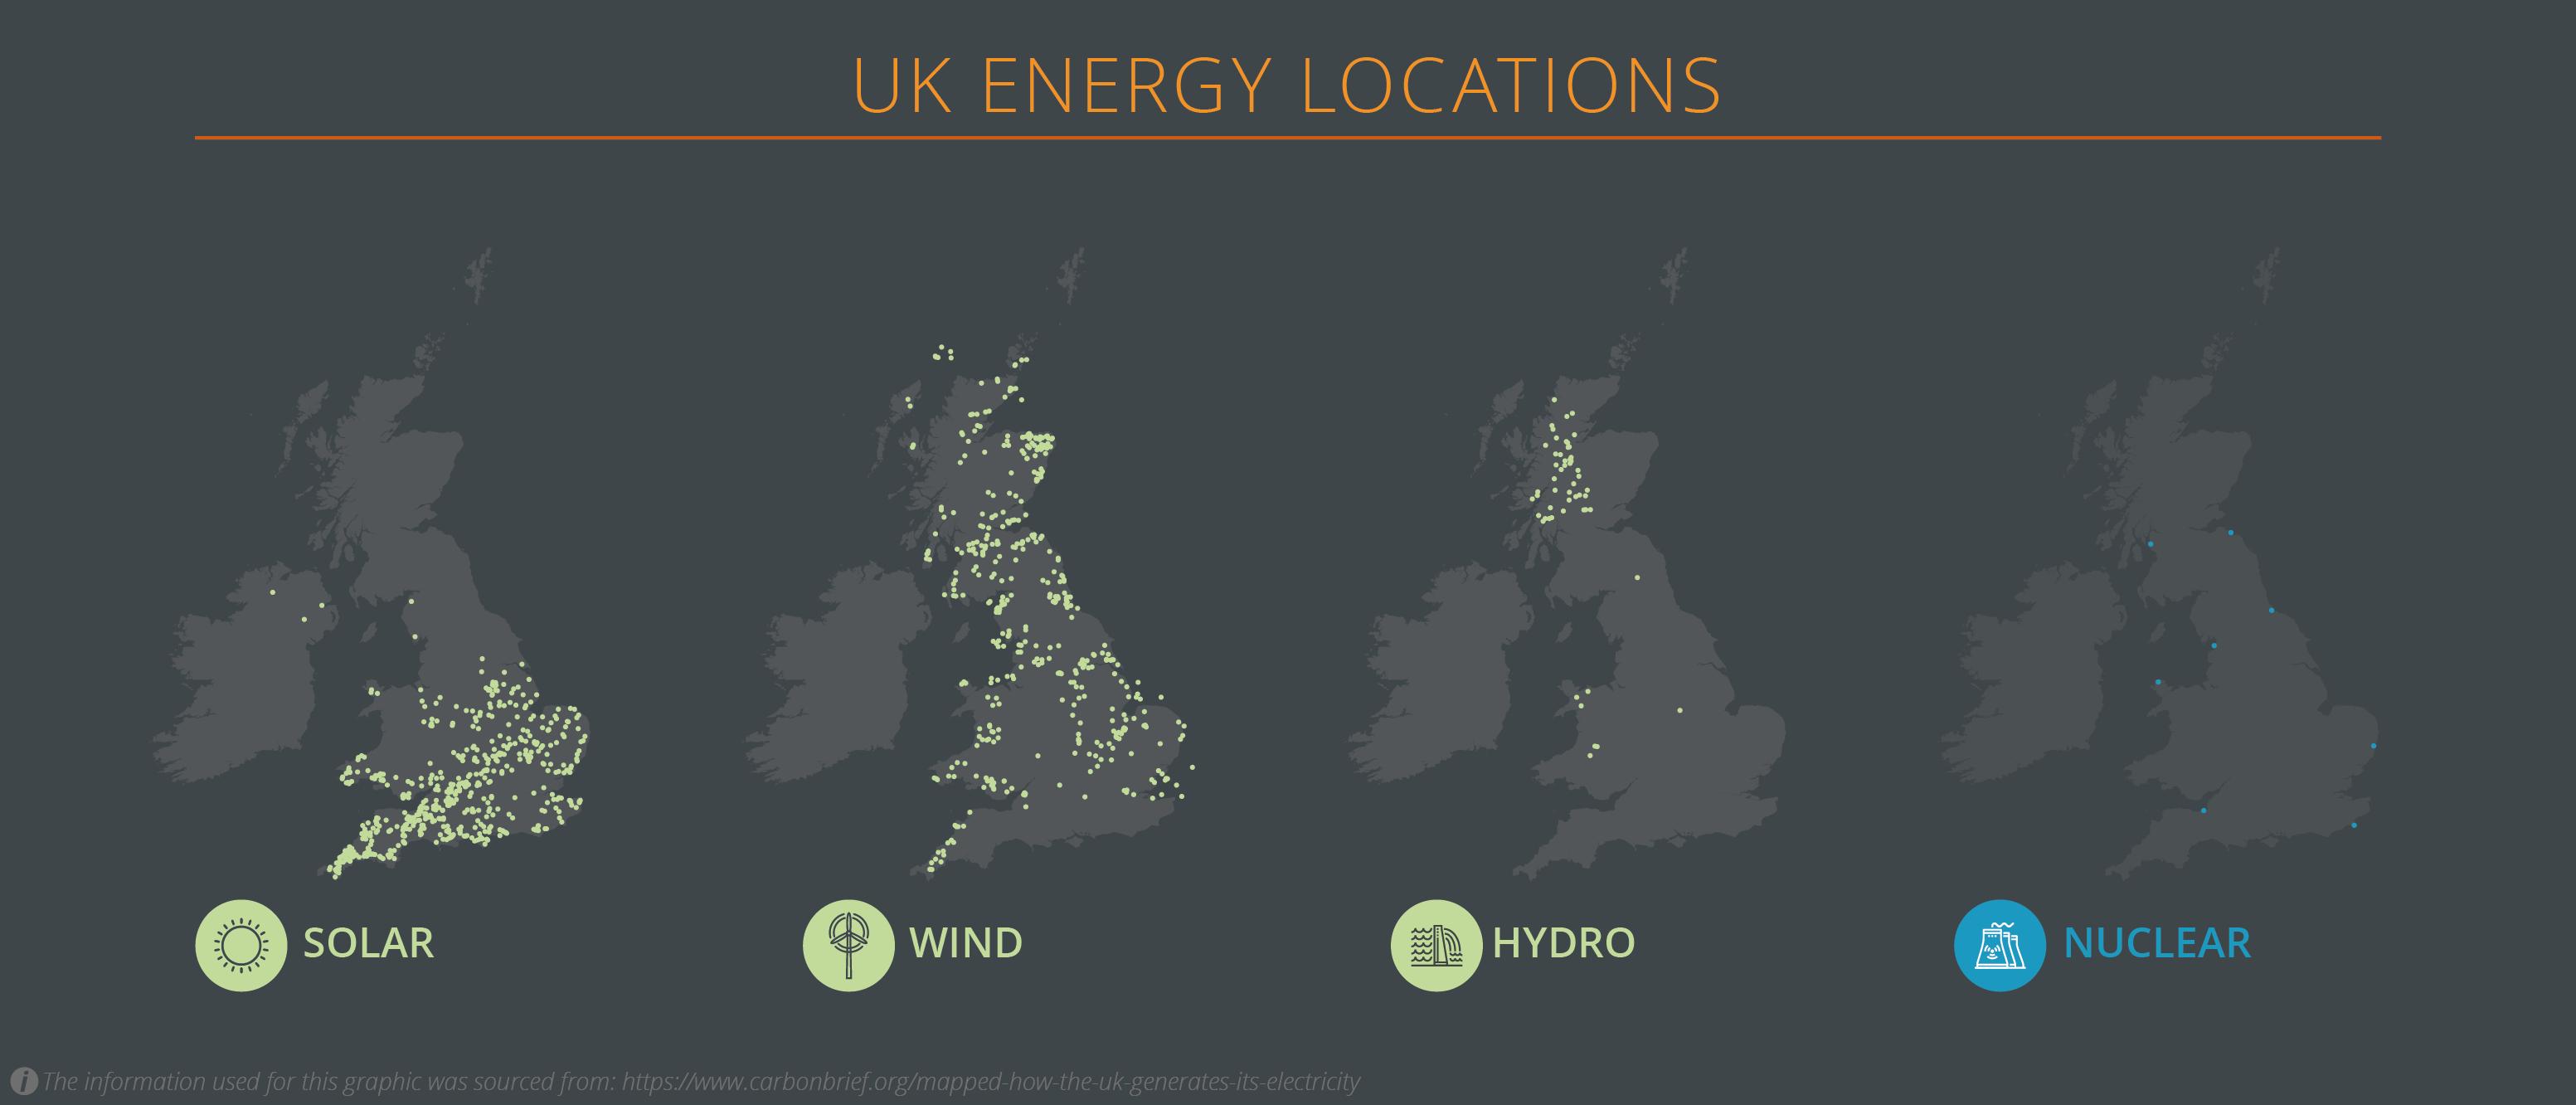 UK Energy production locations